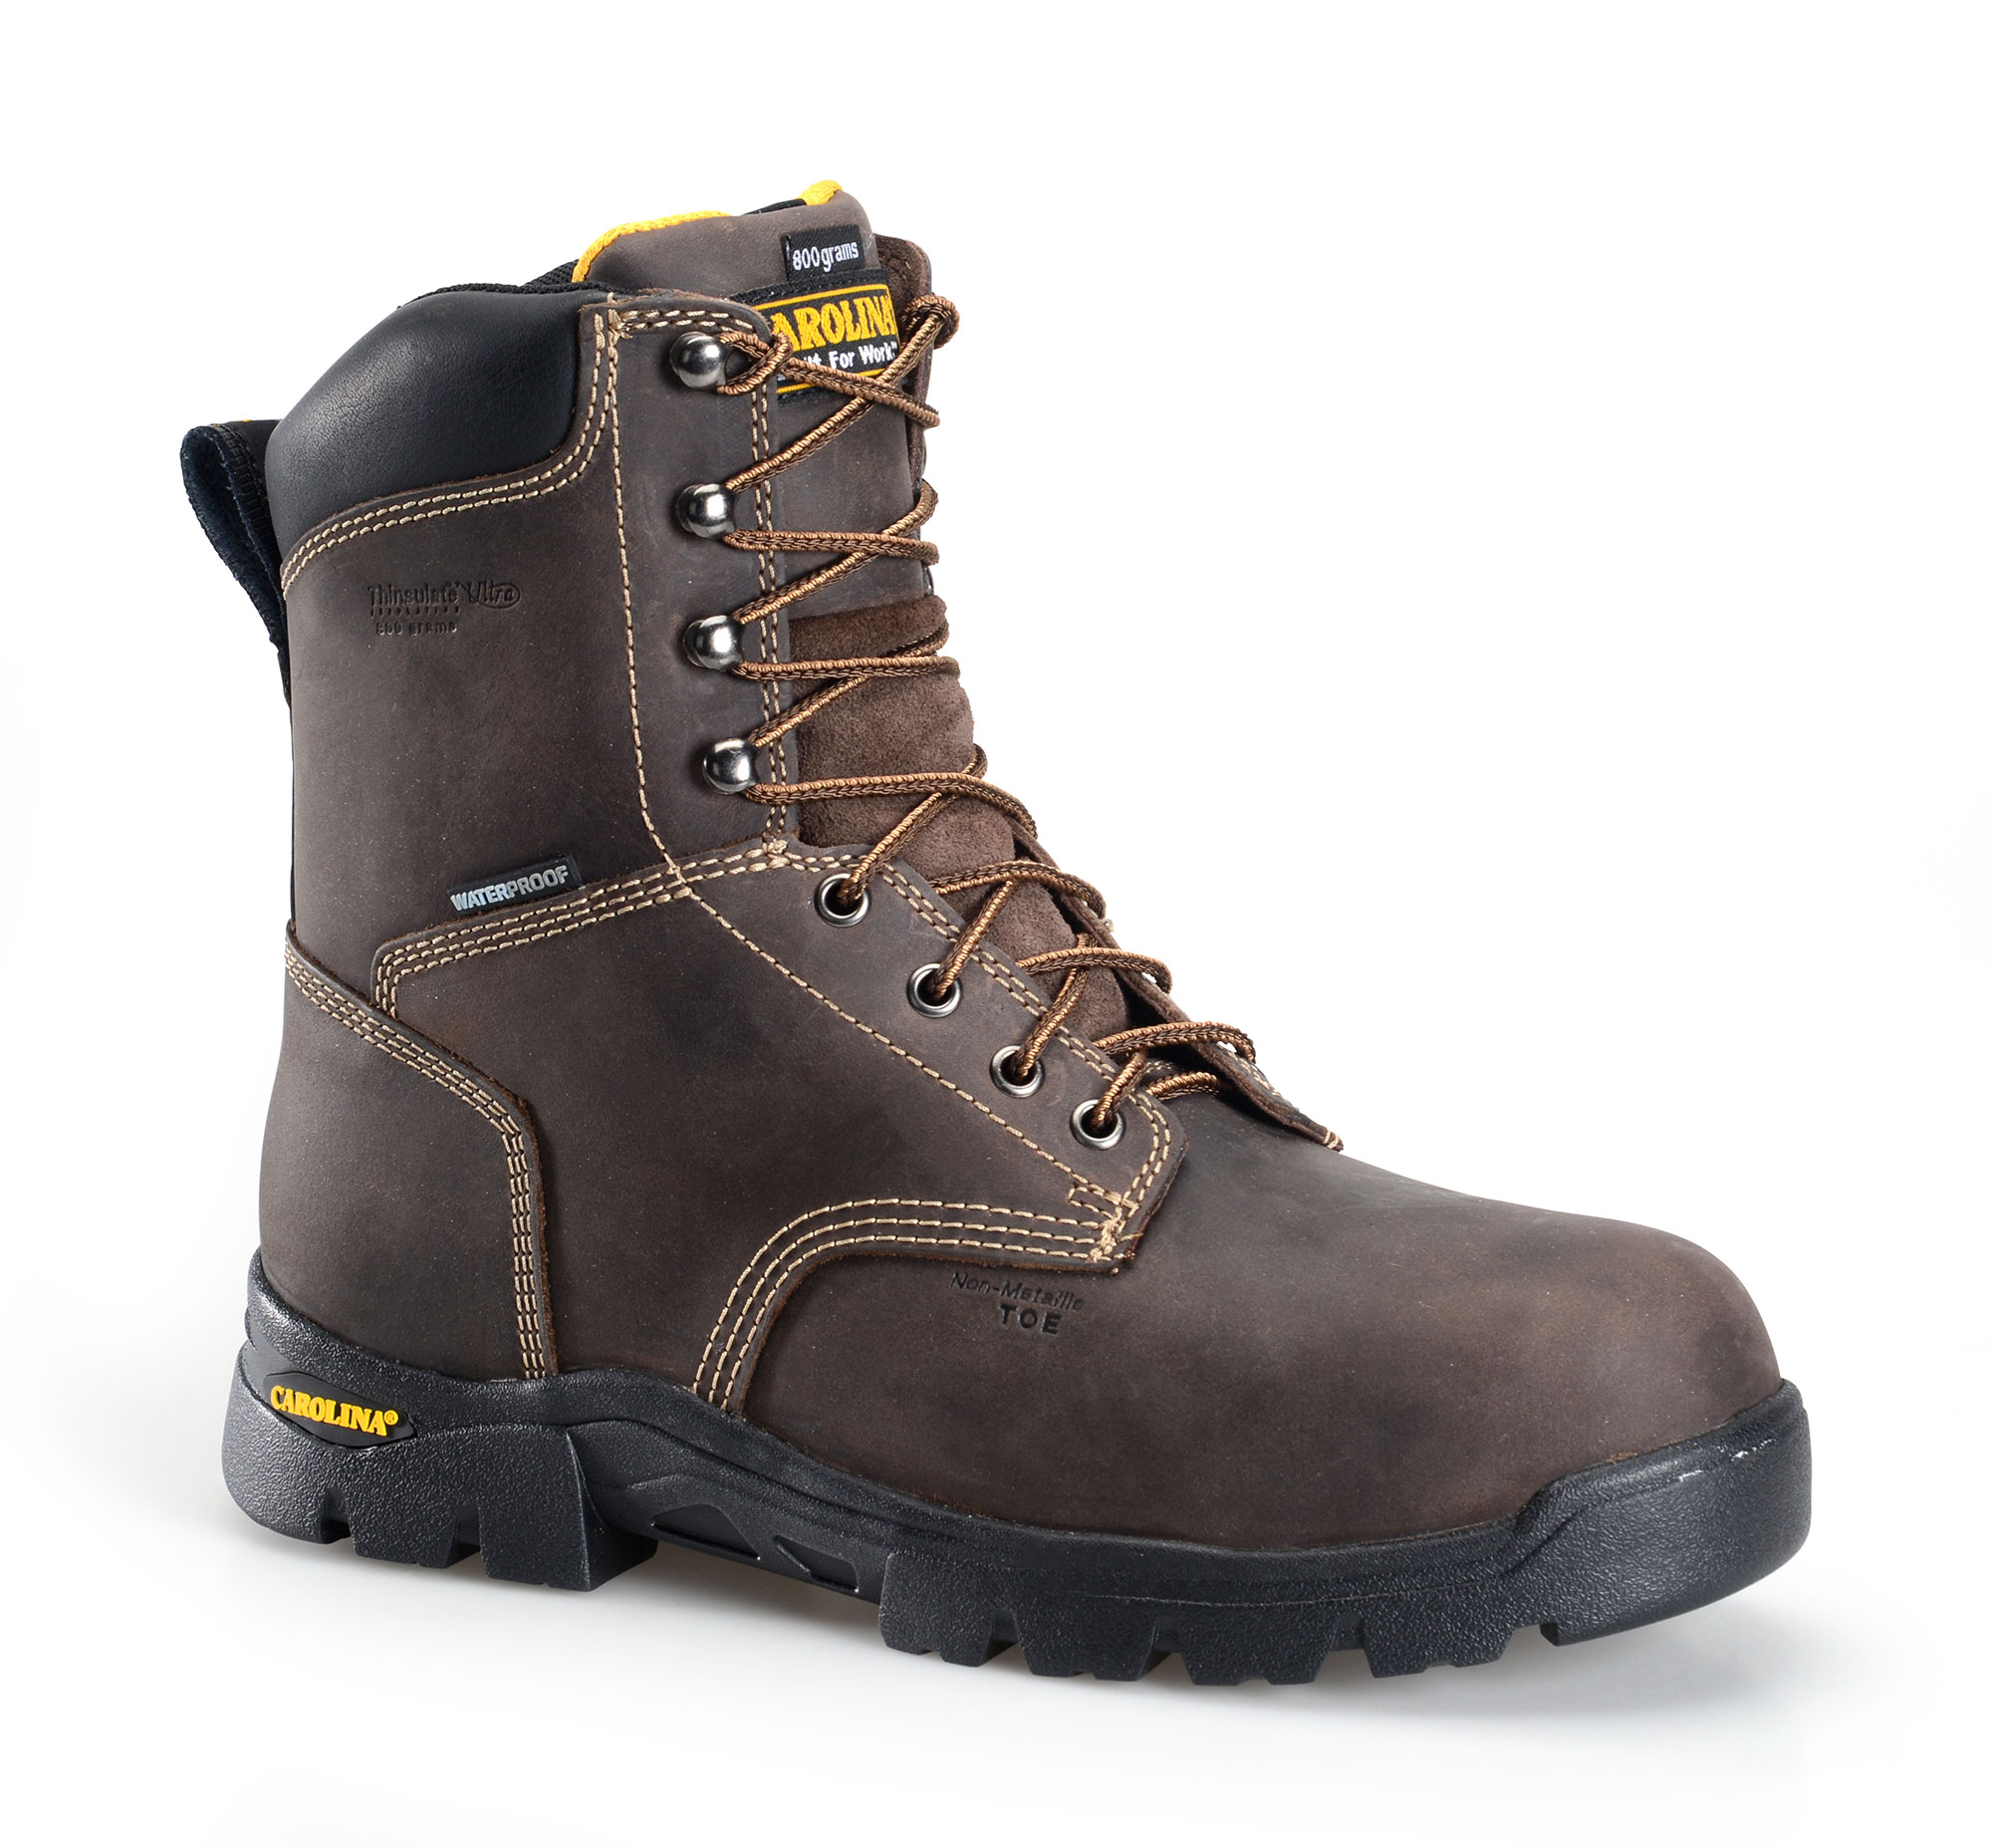 "Carolina 8"" Composite Toe Insulated Work Boot"